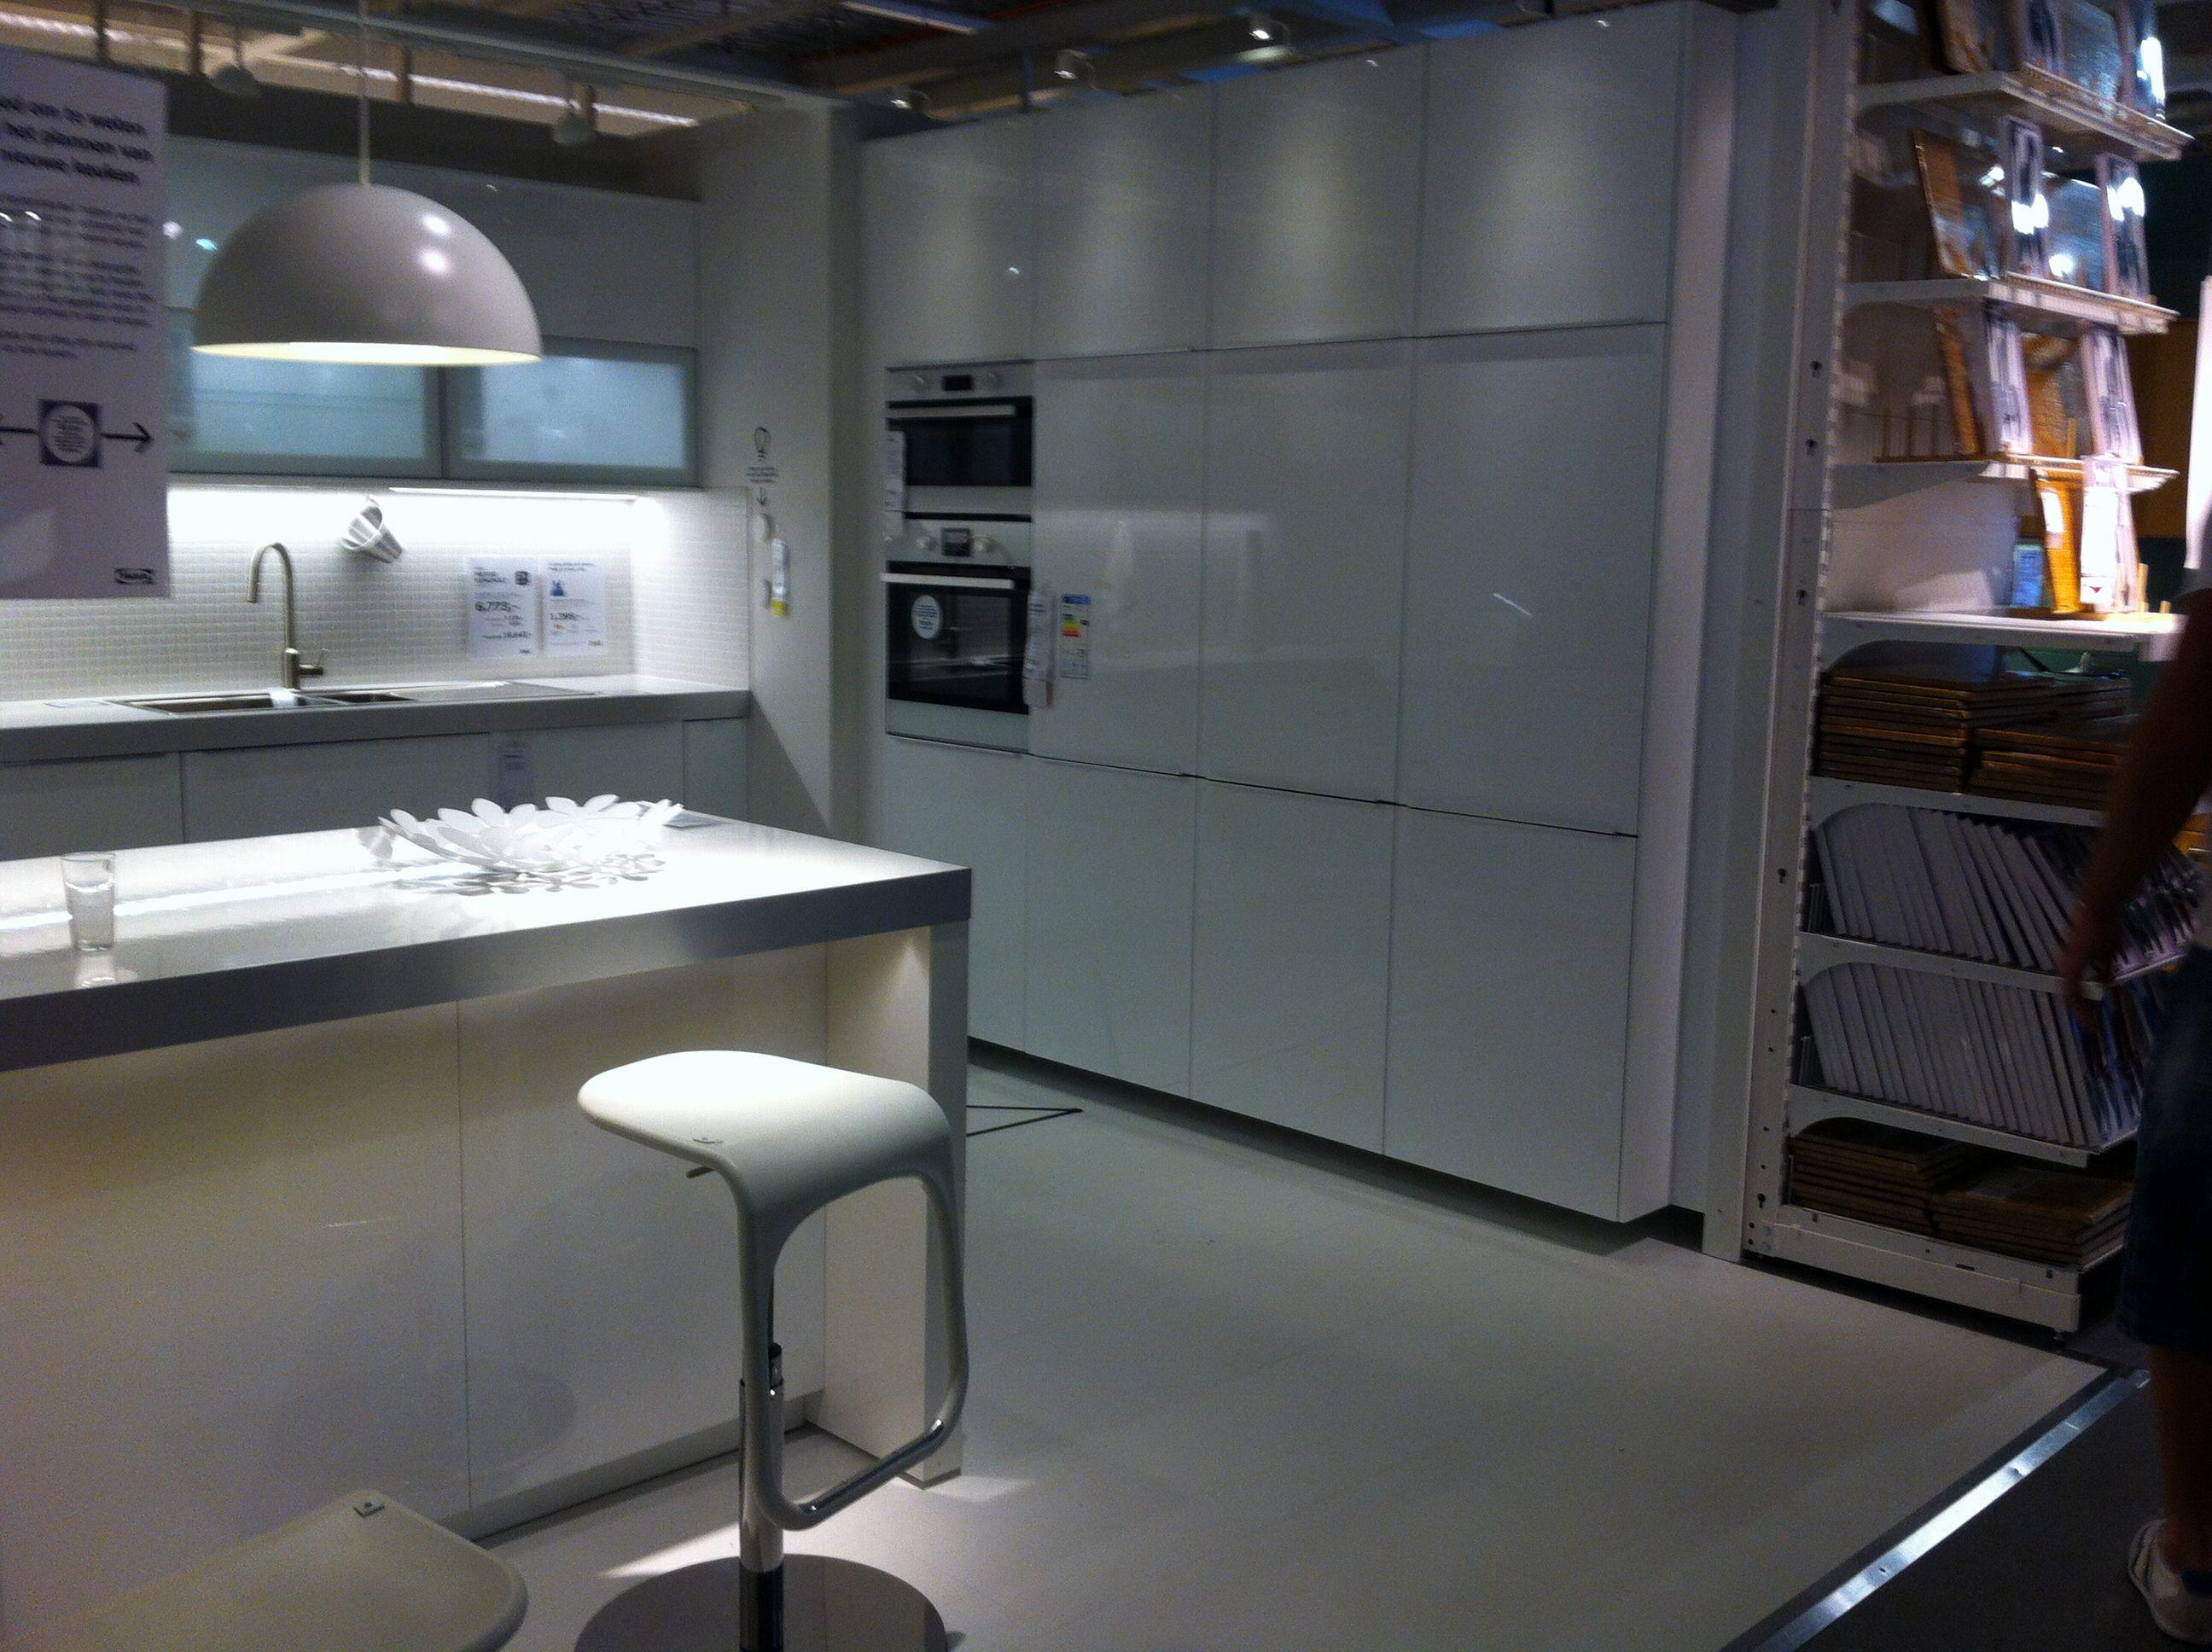 Ikea Küchenrollenhalter ~ Metod ringhult hooglanzend wit keuken ikea gent ikea